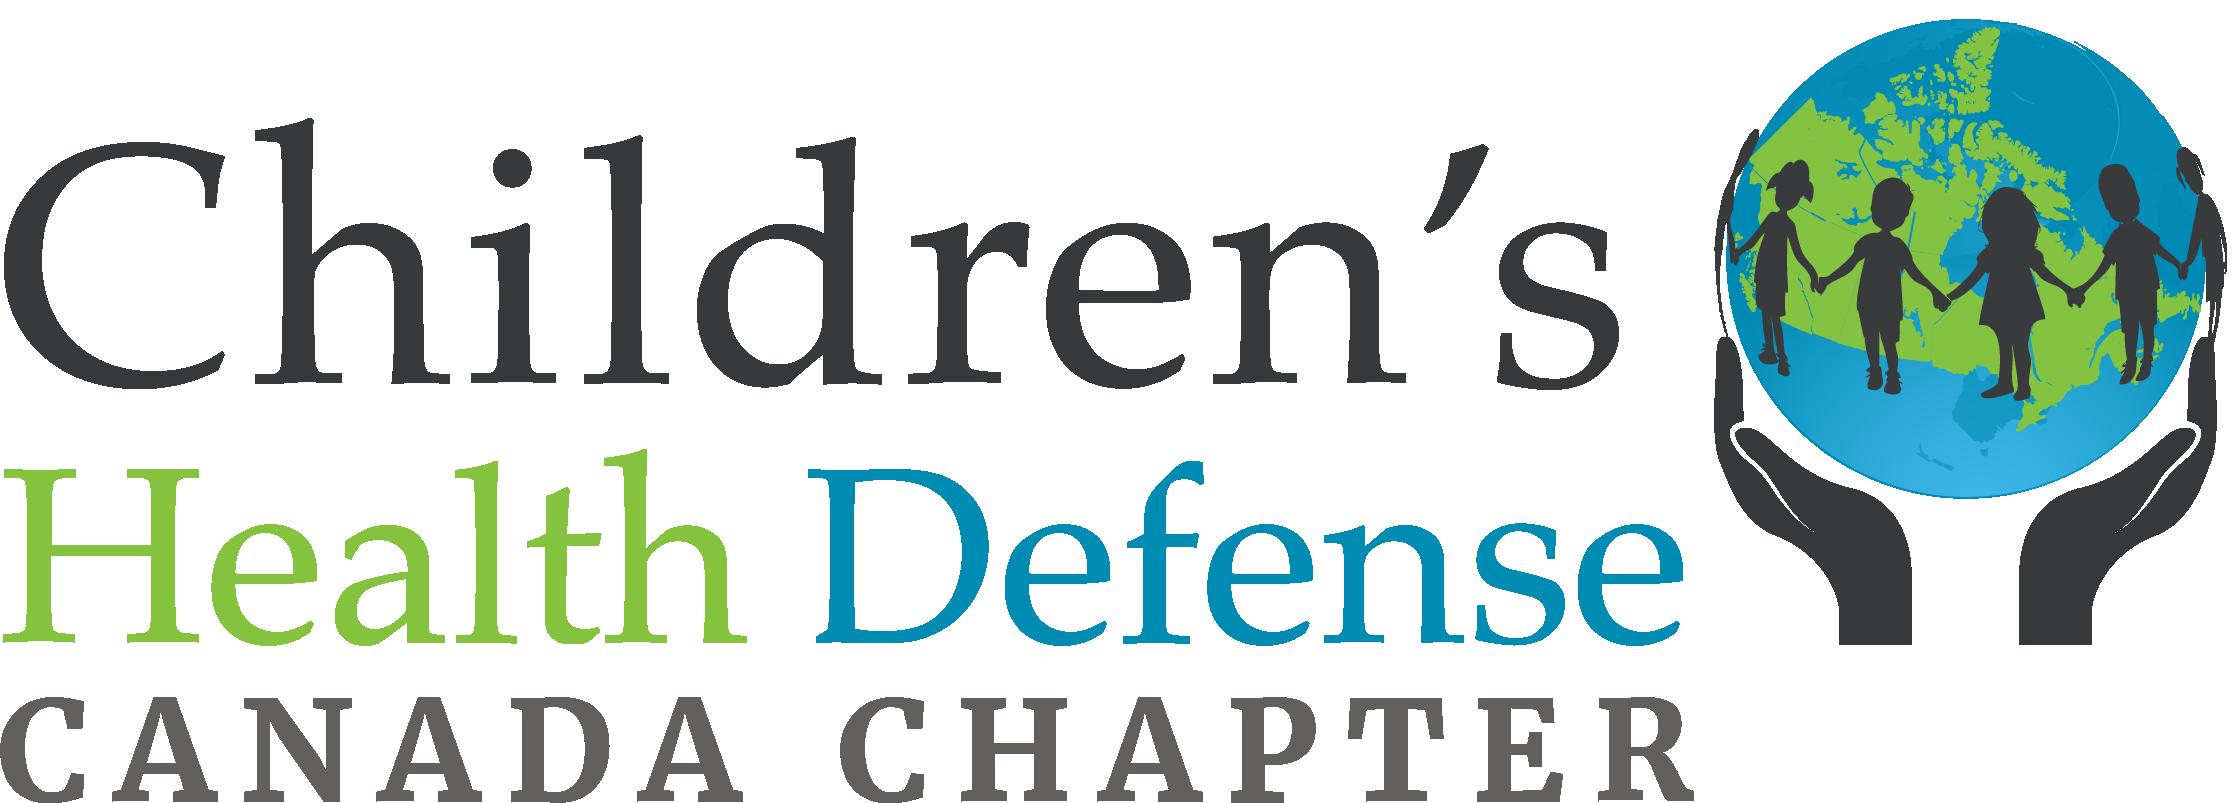 Children's Health Defense Canada Chapter